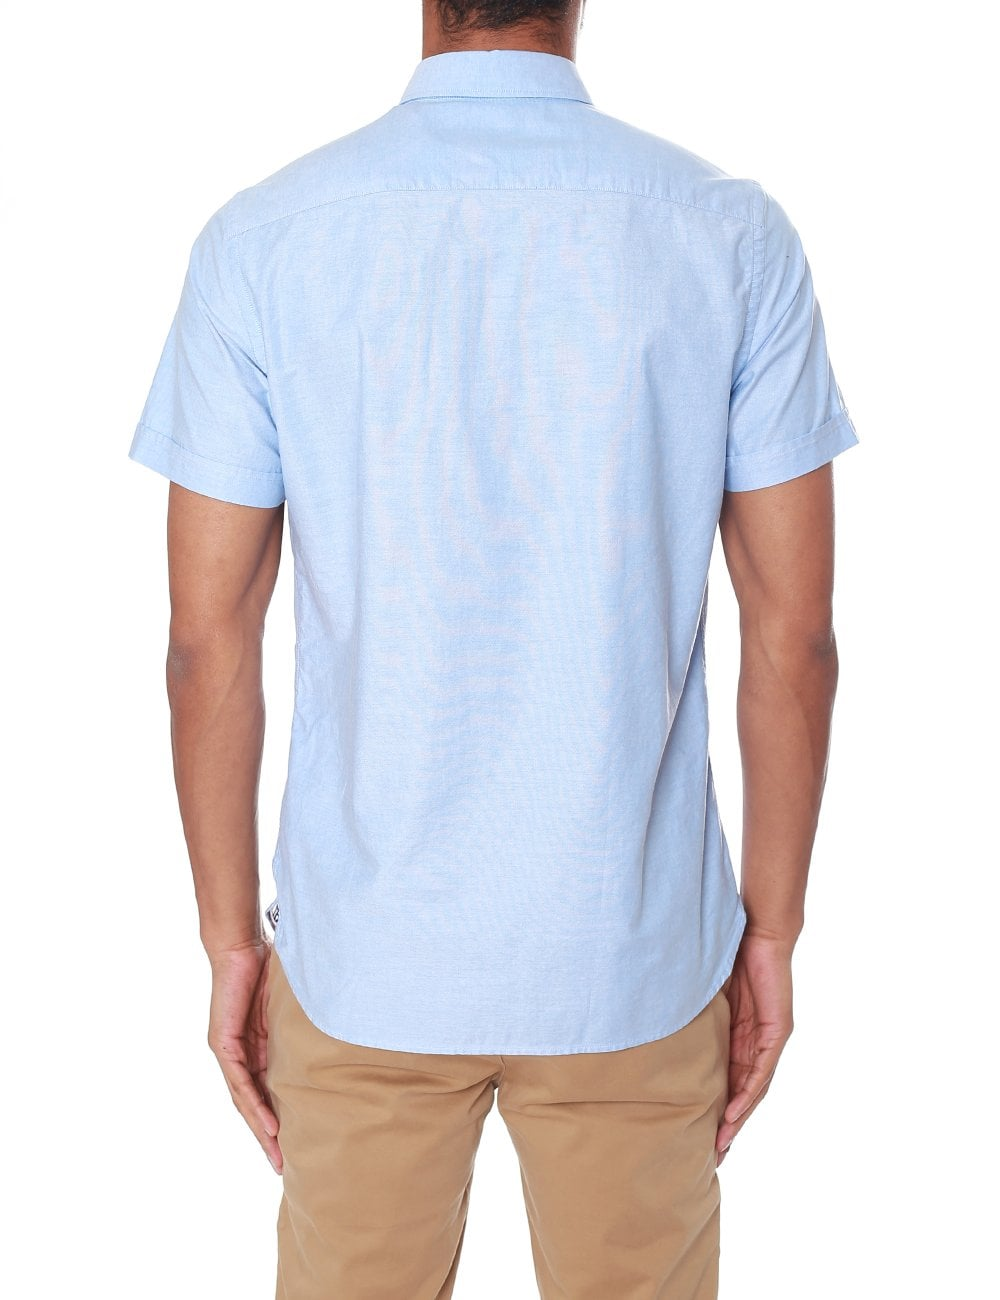 d4402528 Tommy Hilfiger Men's Slim Organic Oxford Short Sleeve Shirt Shirt Blue